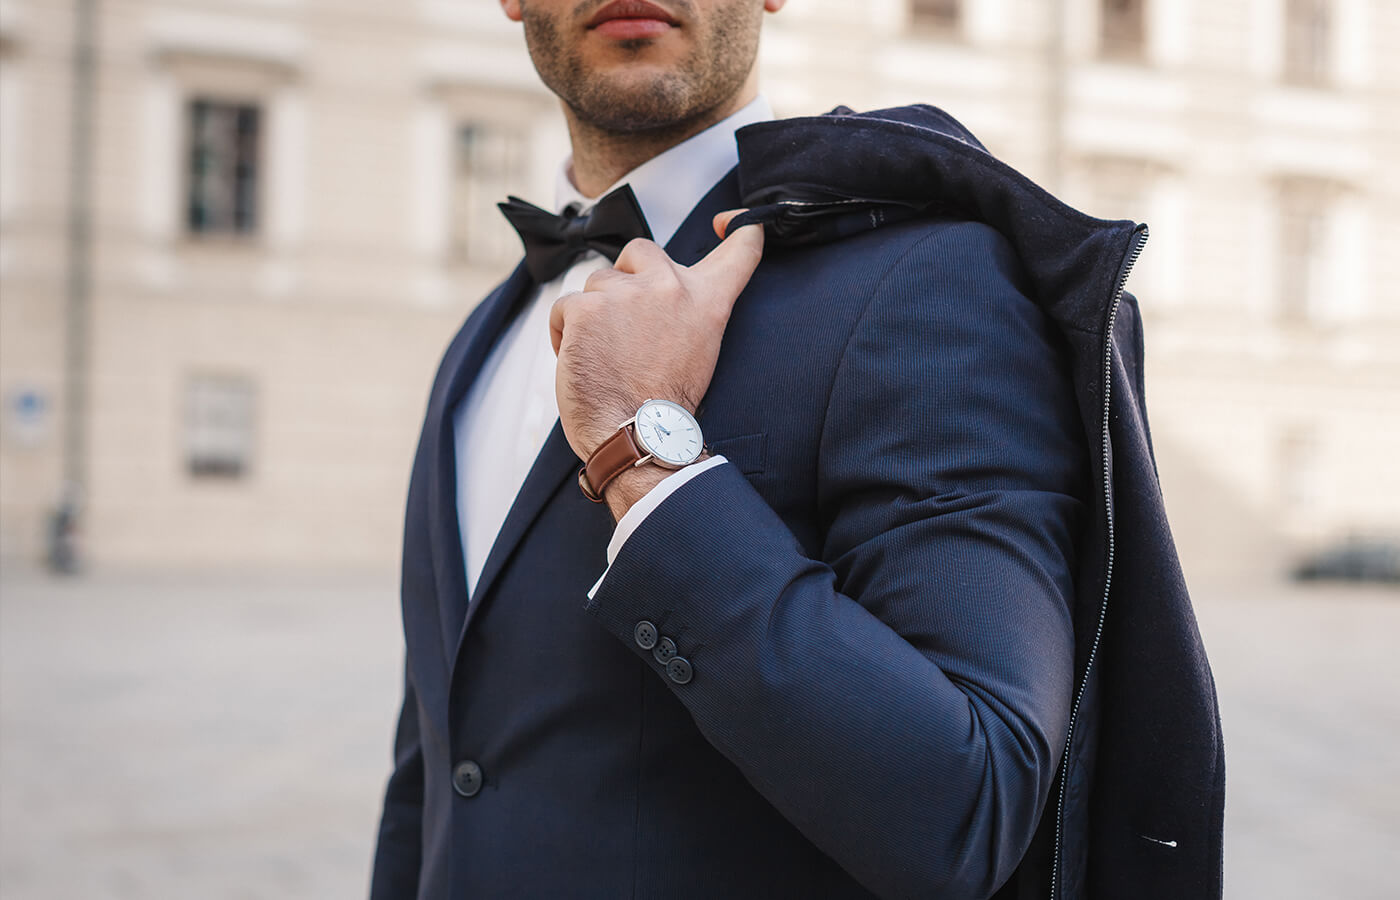 men with wrist watch